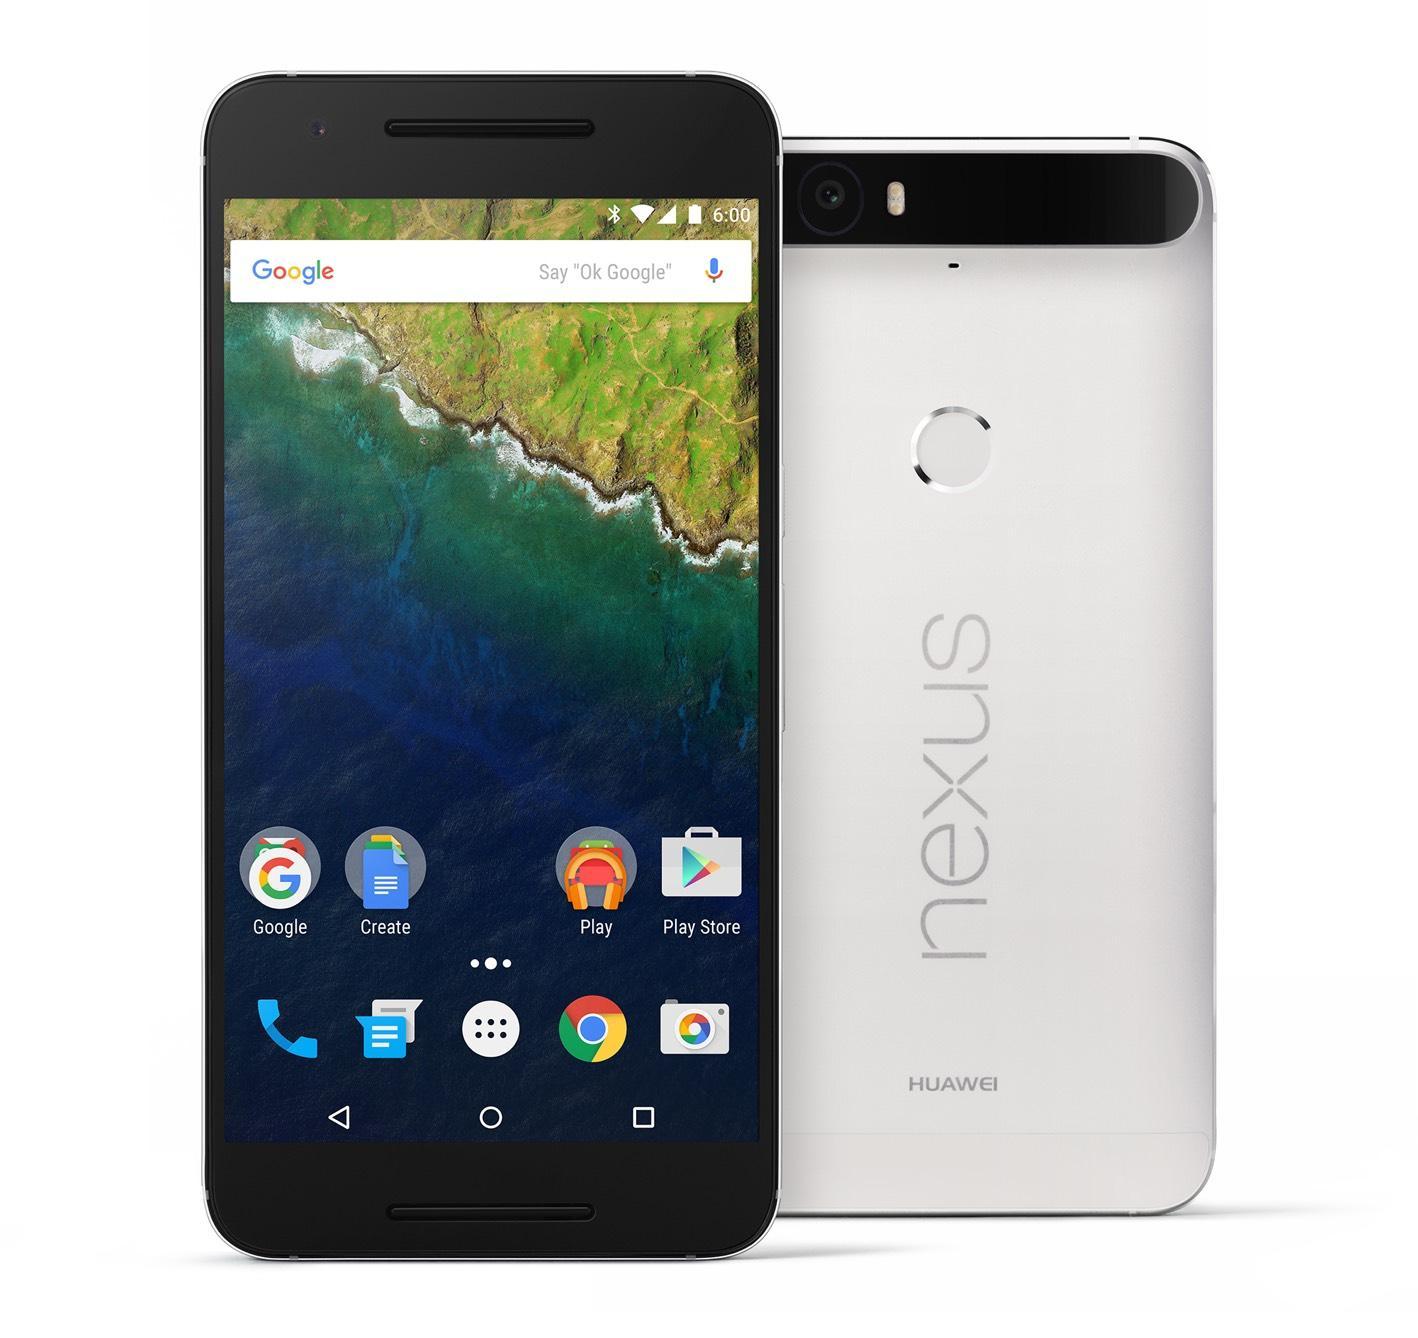 "Smartphone 5.7"" Huawei Nexus 6P Blanc - 2560x1440, Snapdragon 810 2.0GHz, RAM 3Go, 64 Go, Android 6.0"